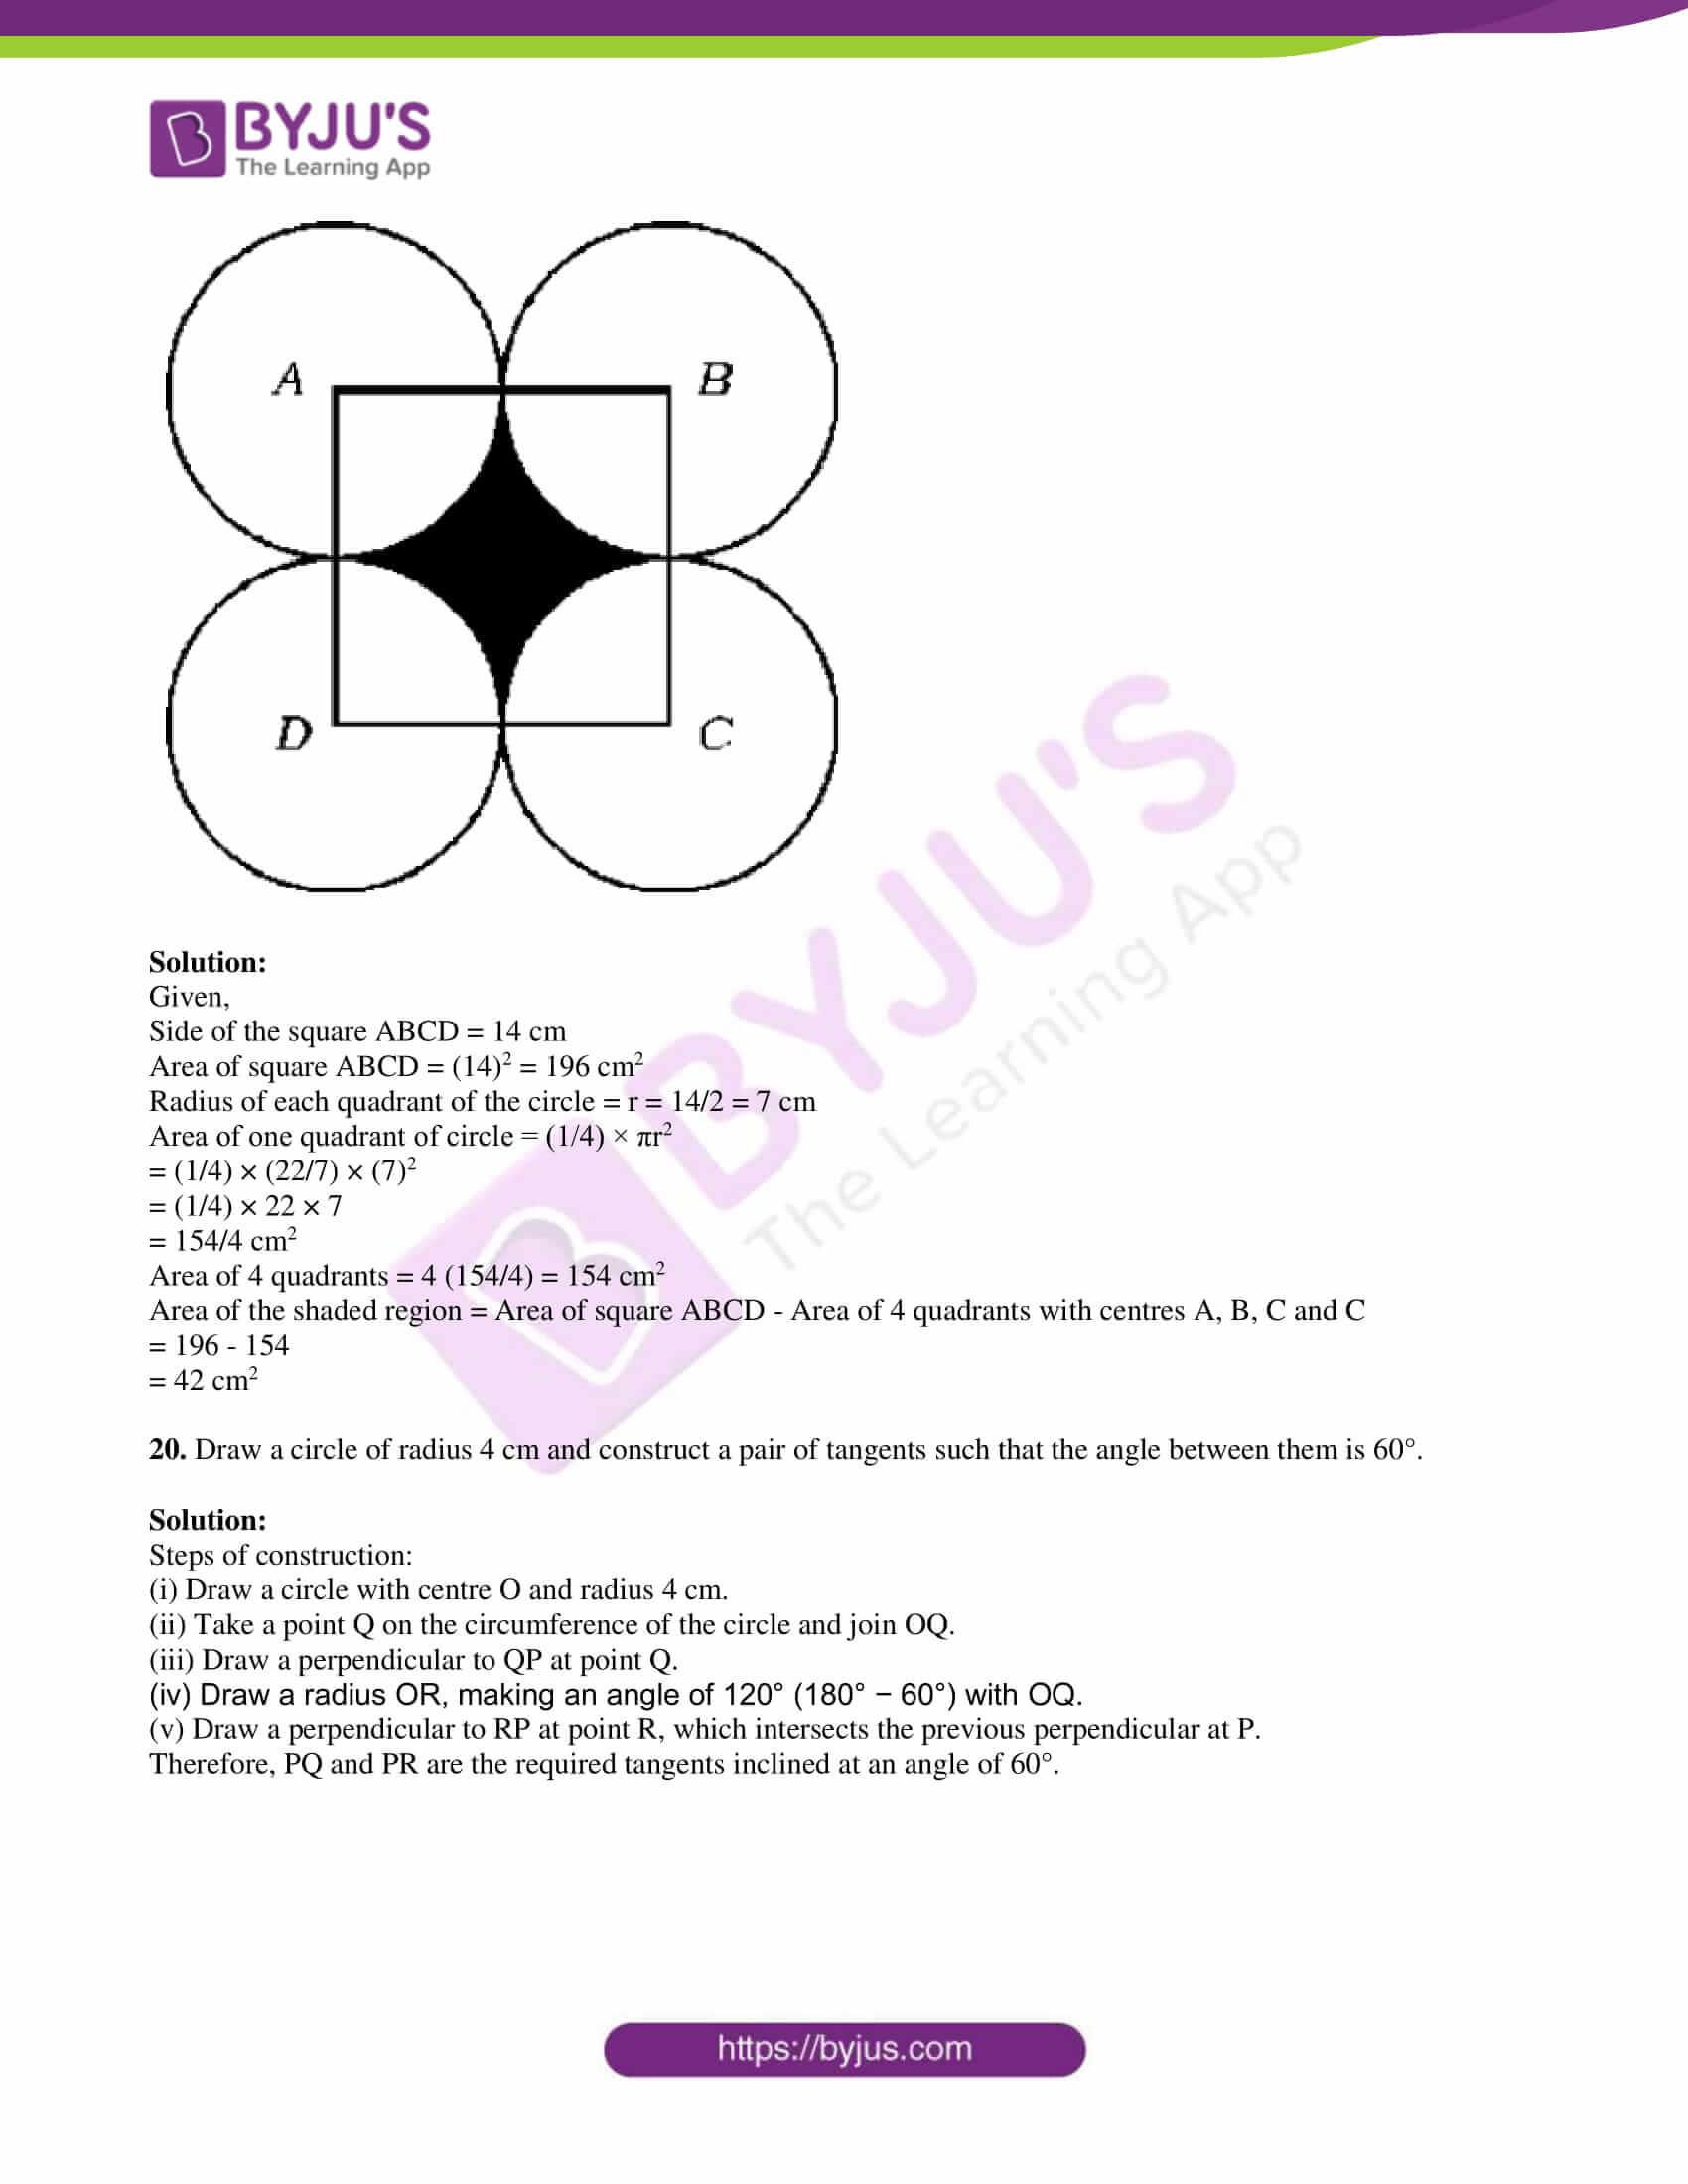 kseeb class 10 maths question paper solution 2019 09